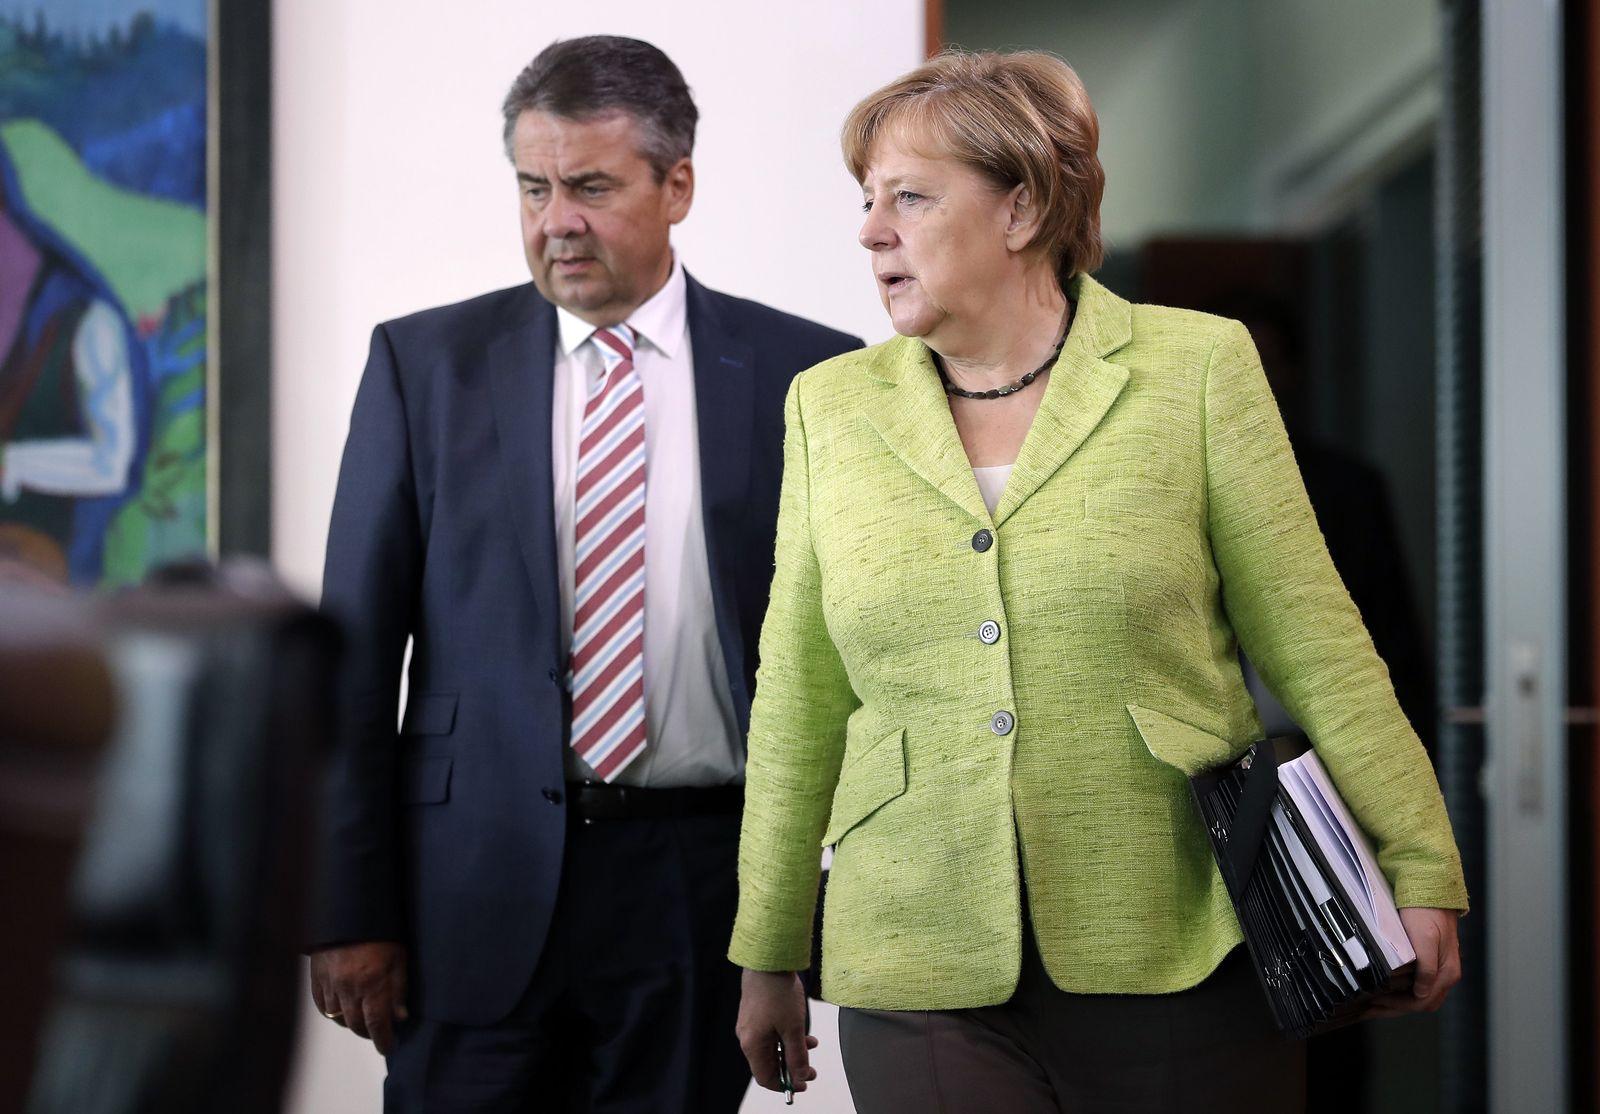 Gabriel/ Merkel